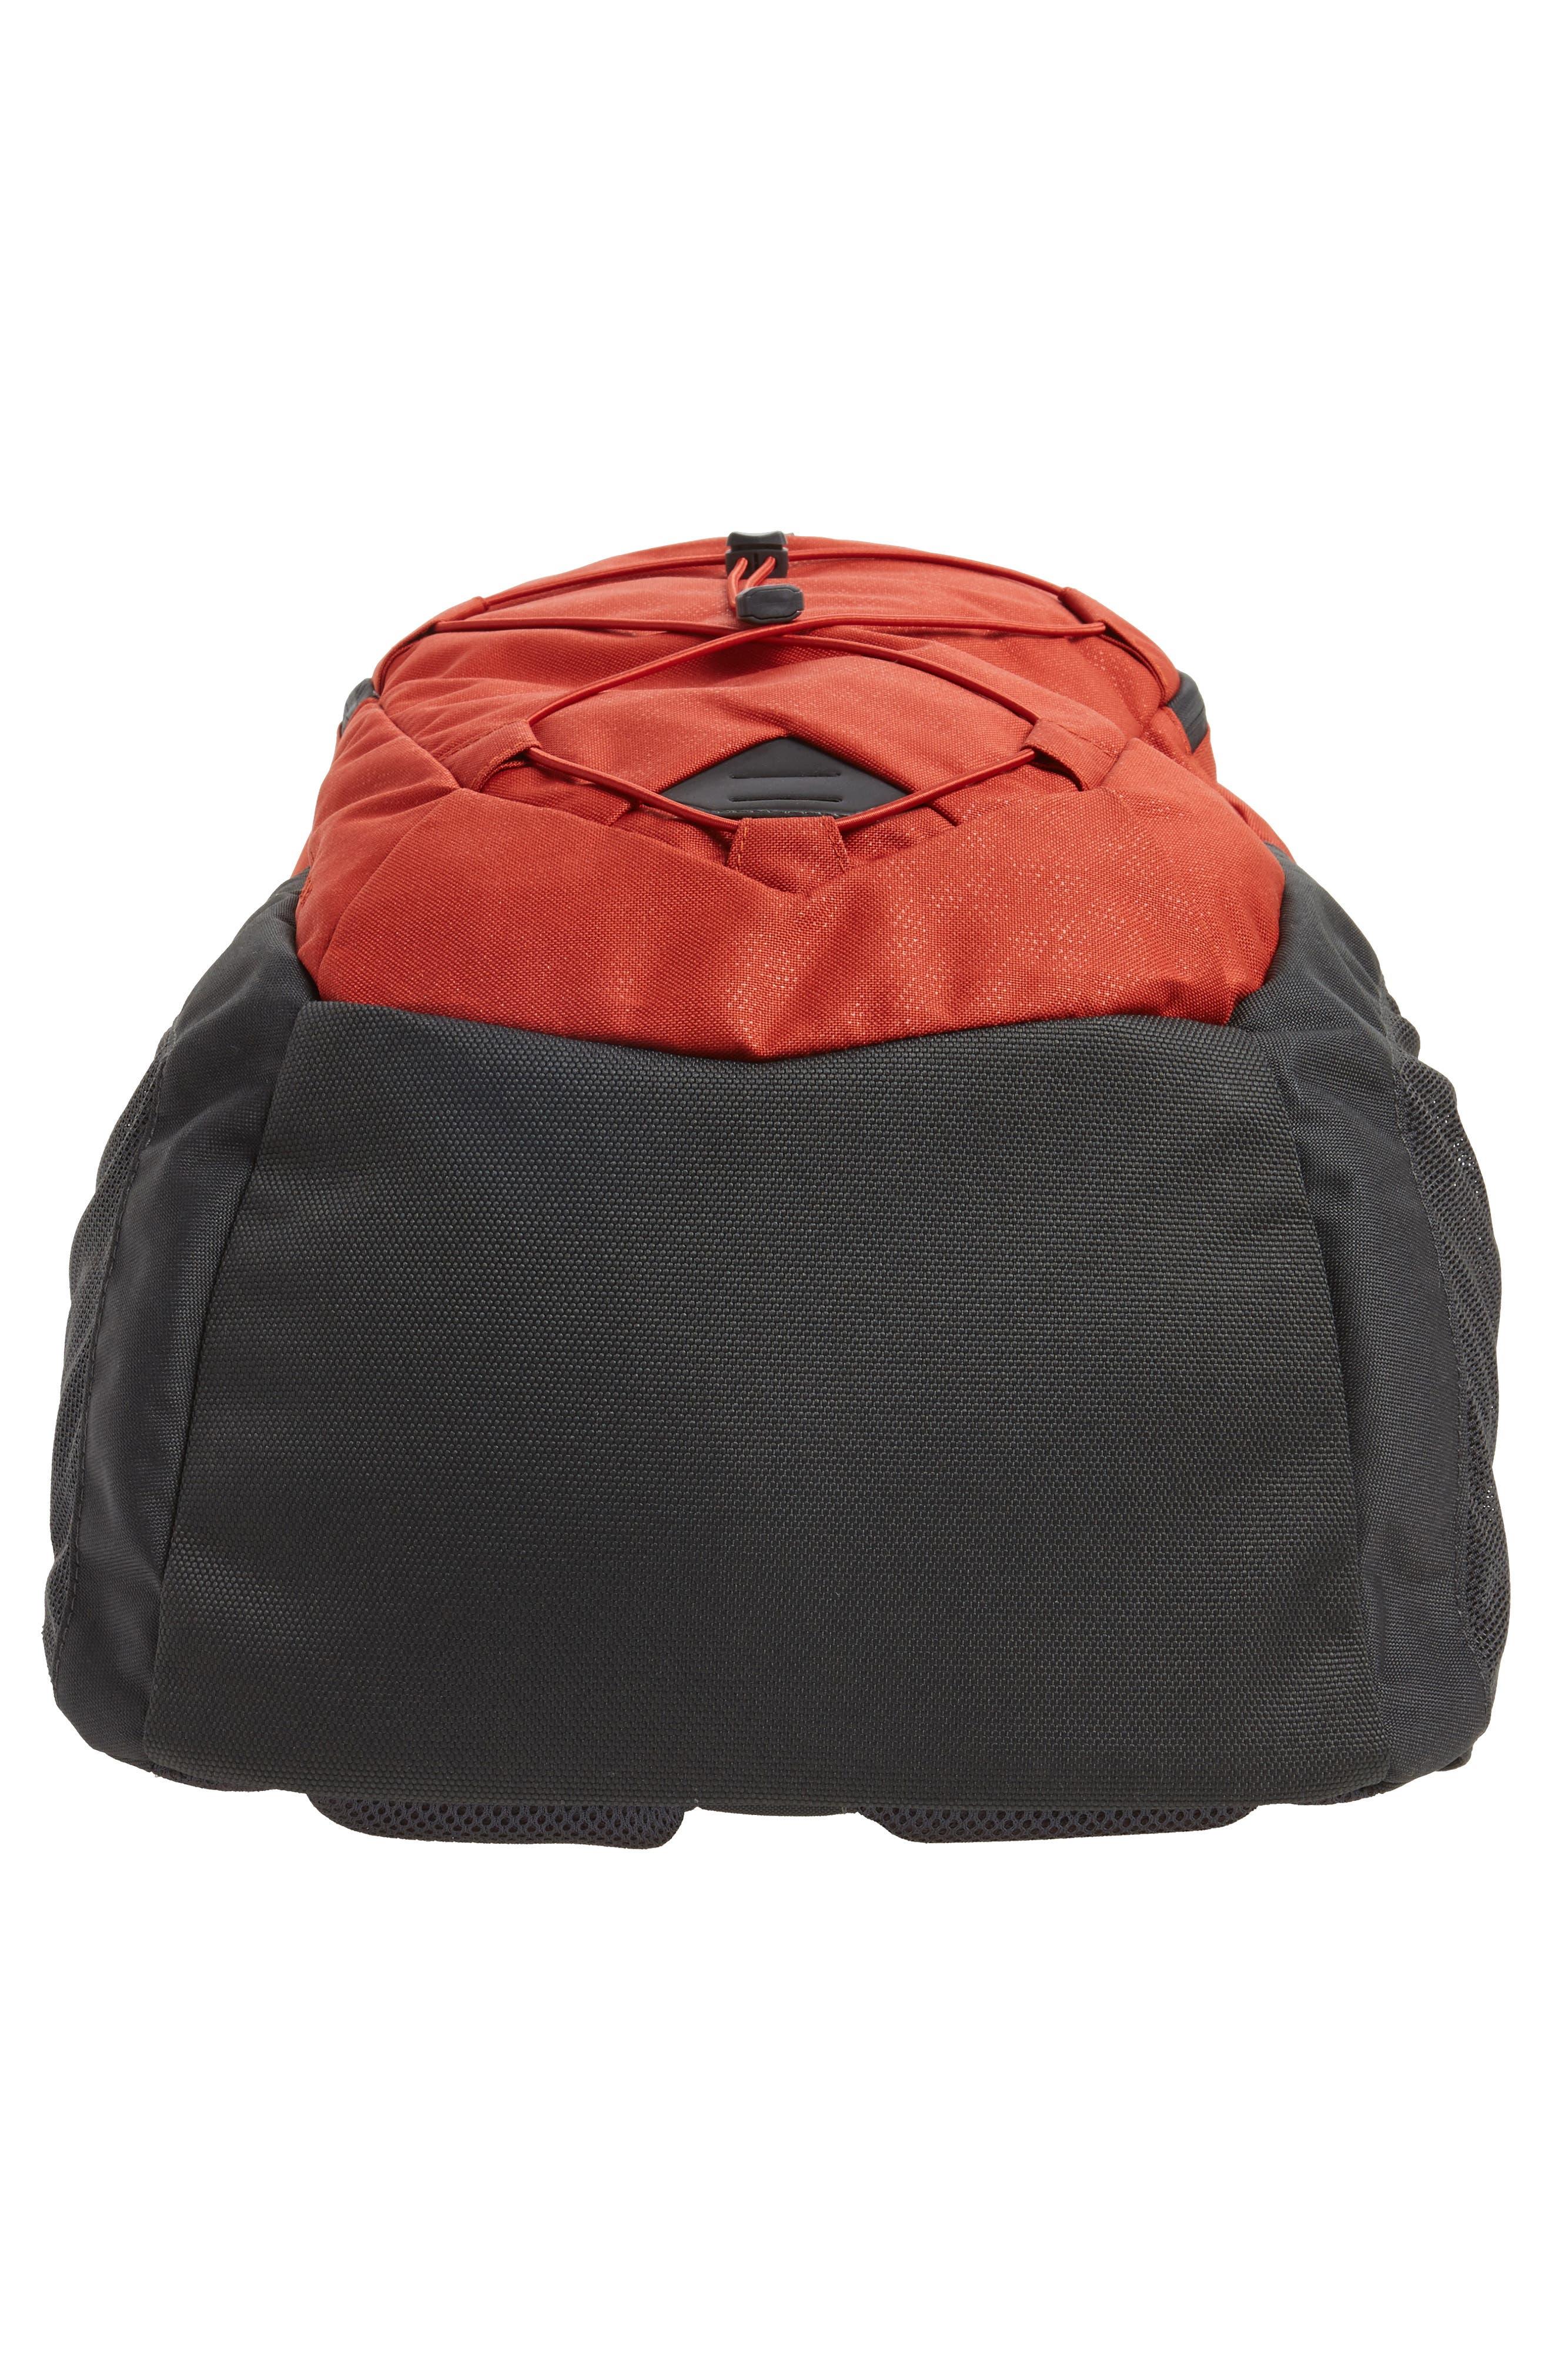 'Jester' Backpack,                             Alternate thumbnail 111, color,